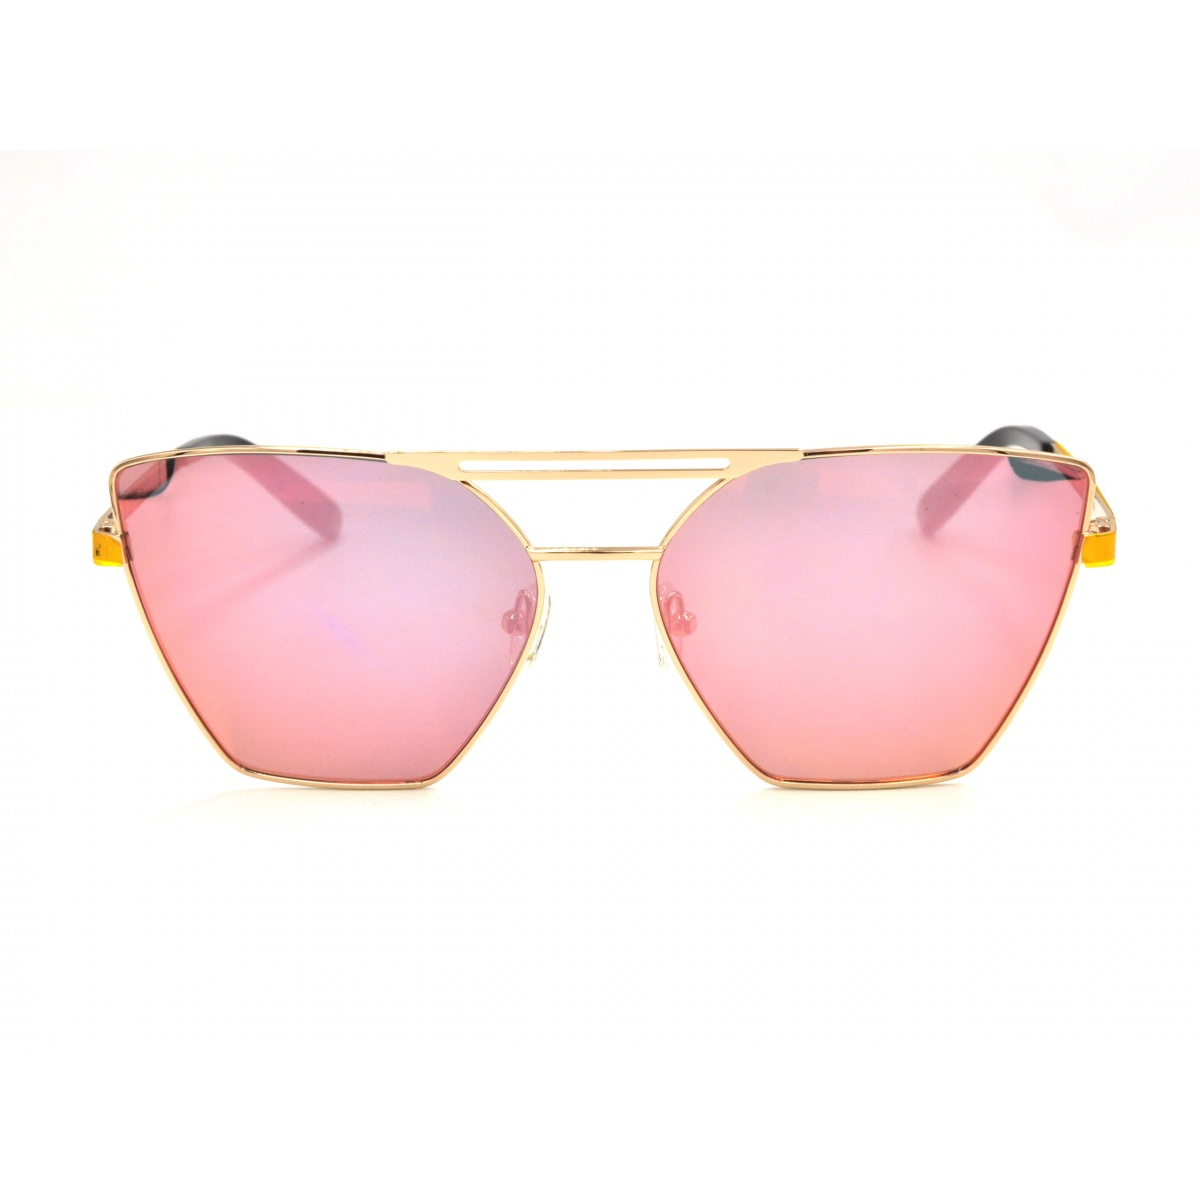 PORTER & REYNARD VANESSA C1 Sunglasses Piraeus